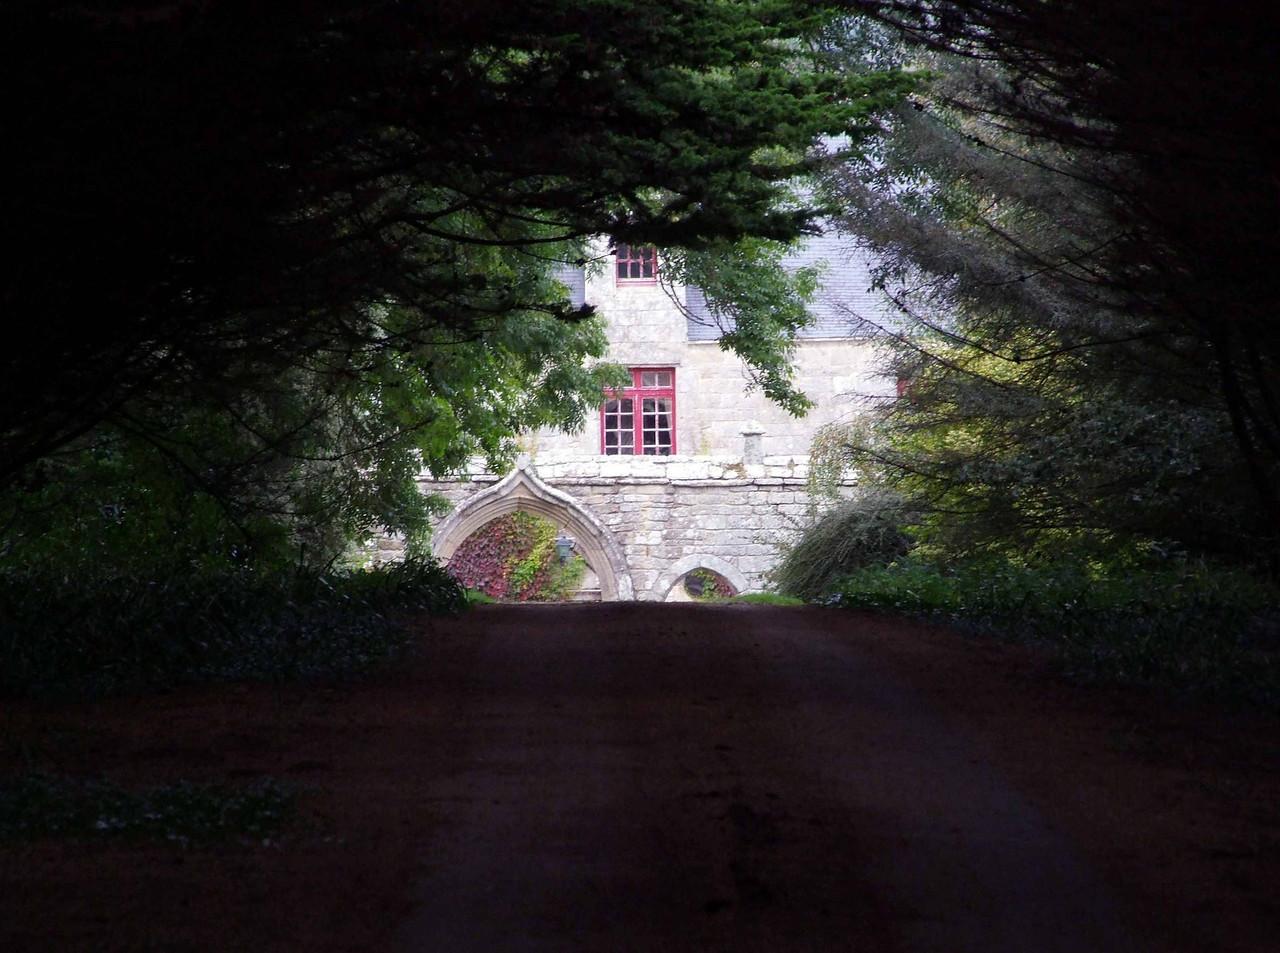 Primelin - Manoir de Lezurec - September 2012